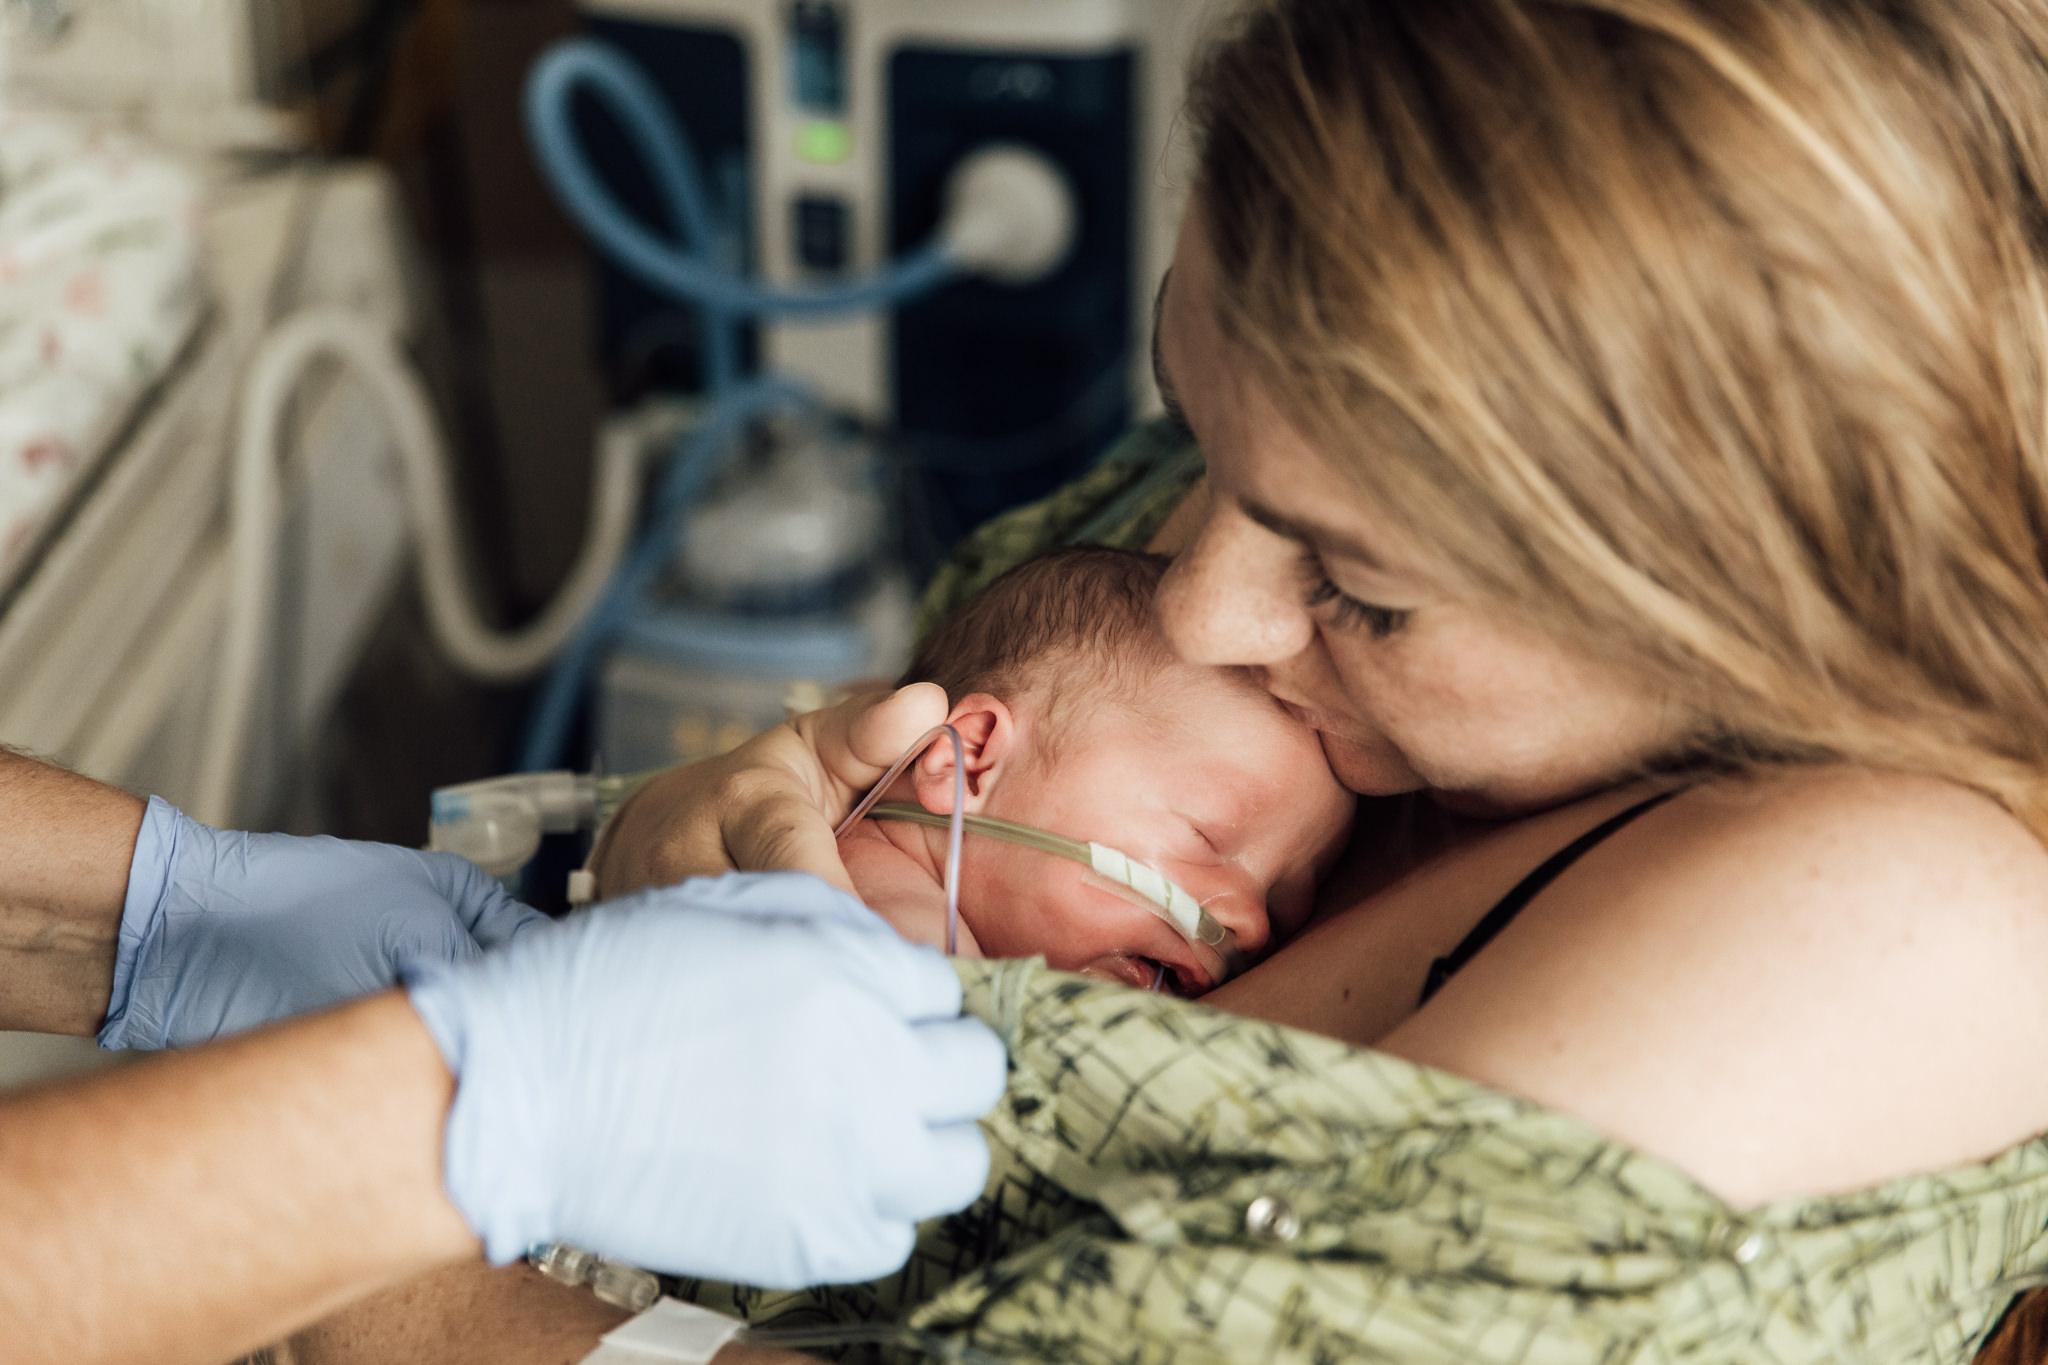 birth-photography-documentary-family-photographer-183.jpg